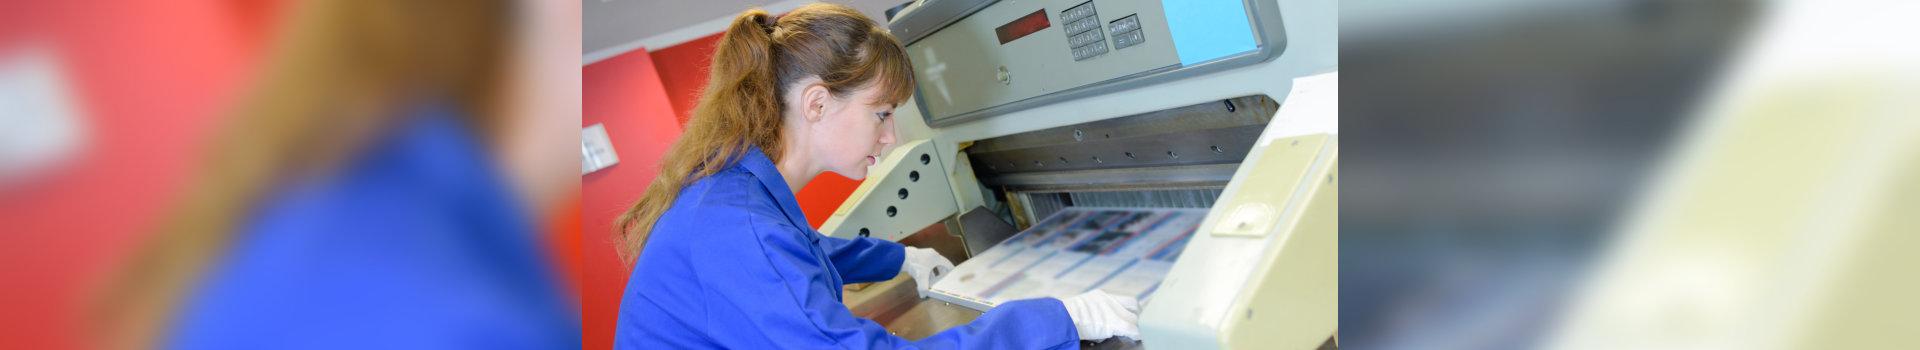 worker and printing machine